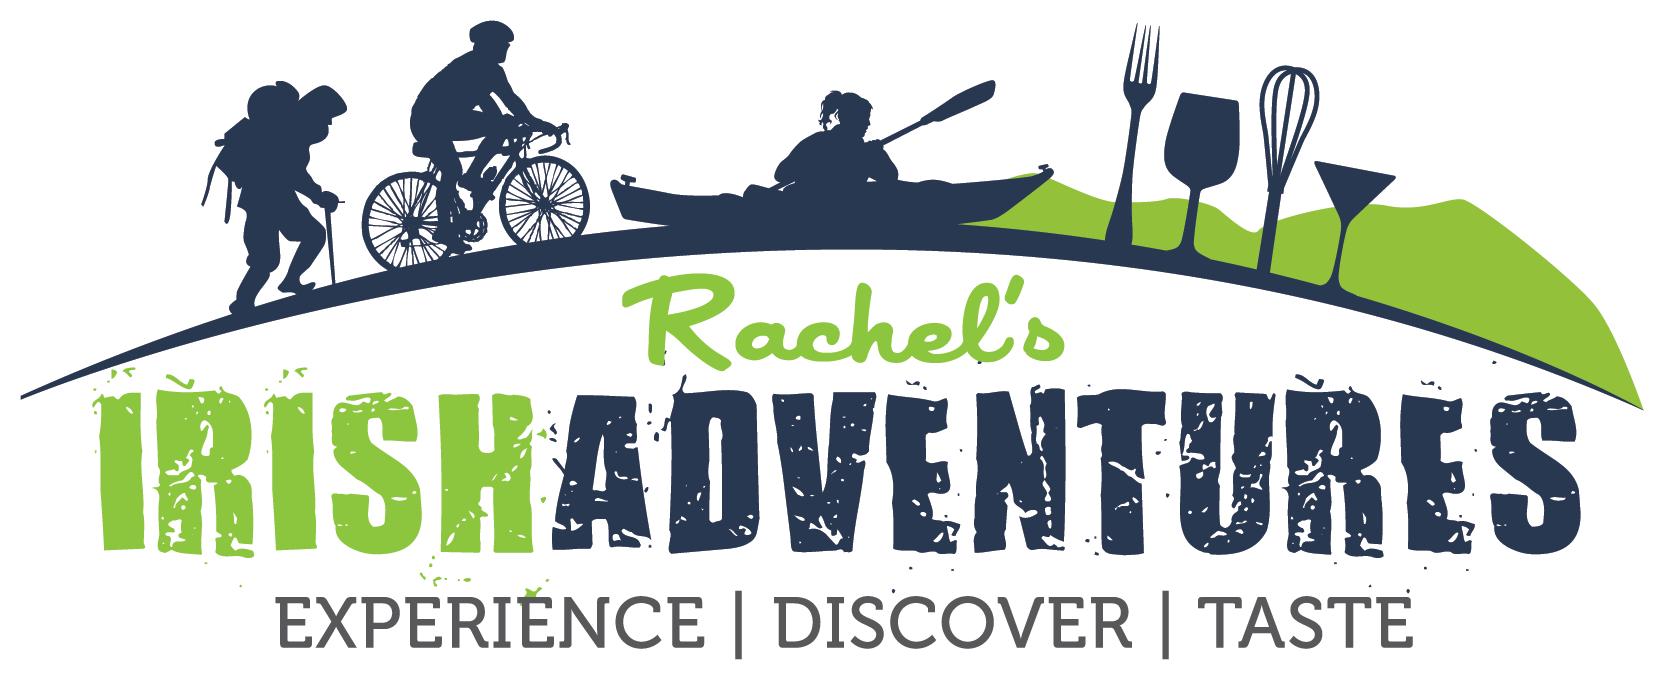 Hike clipart adventure tourism. Holidays tours ireland mayo